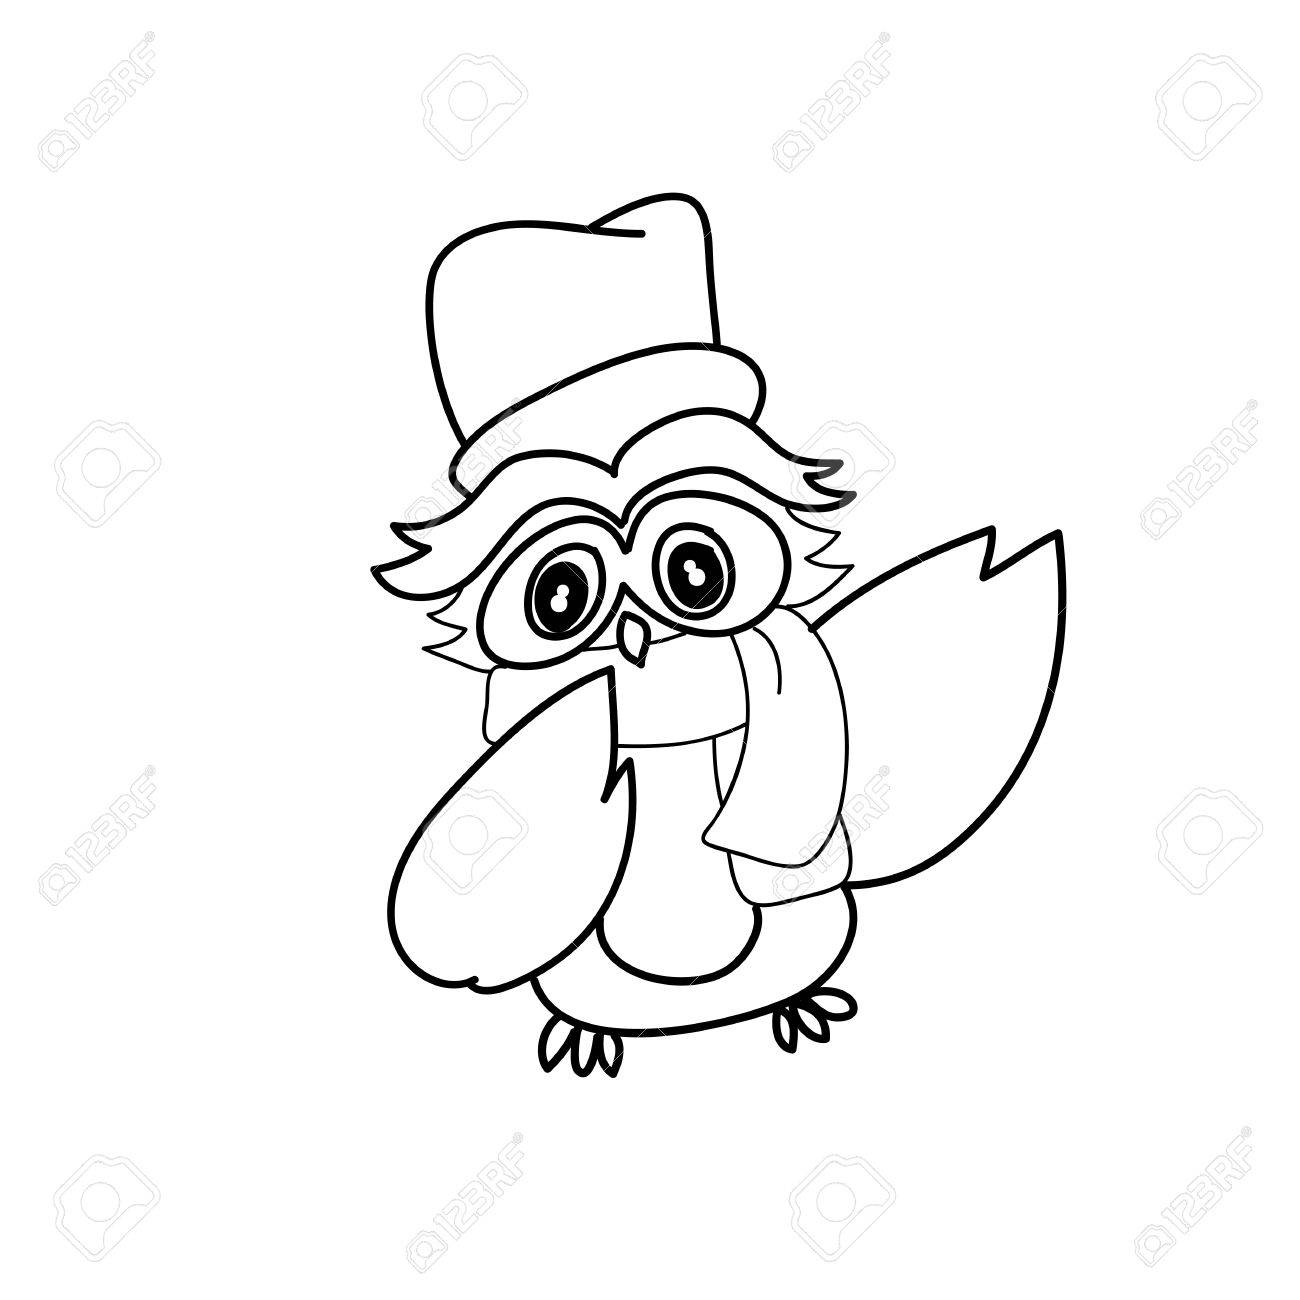 1300x1300 Hand Drawing Cartoon Owl Abstract Character Royalty Free Cliparts